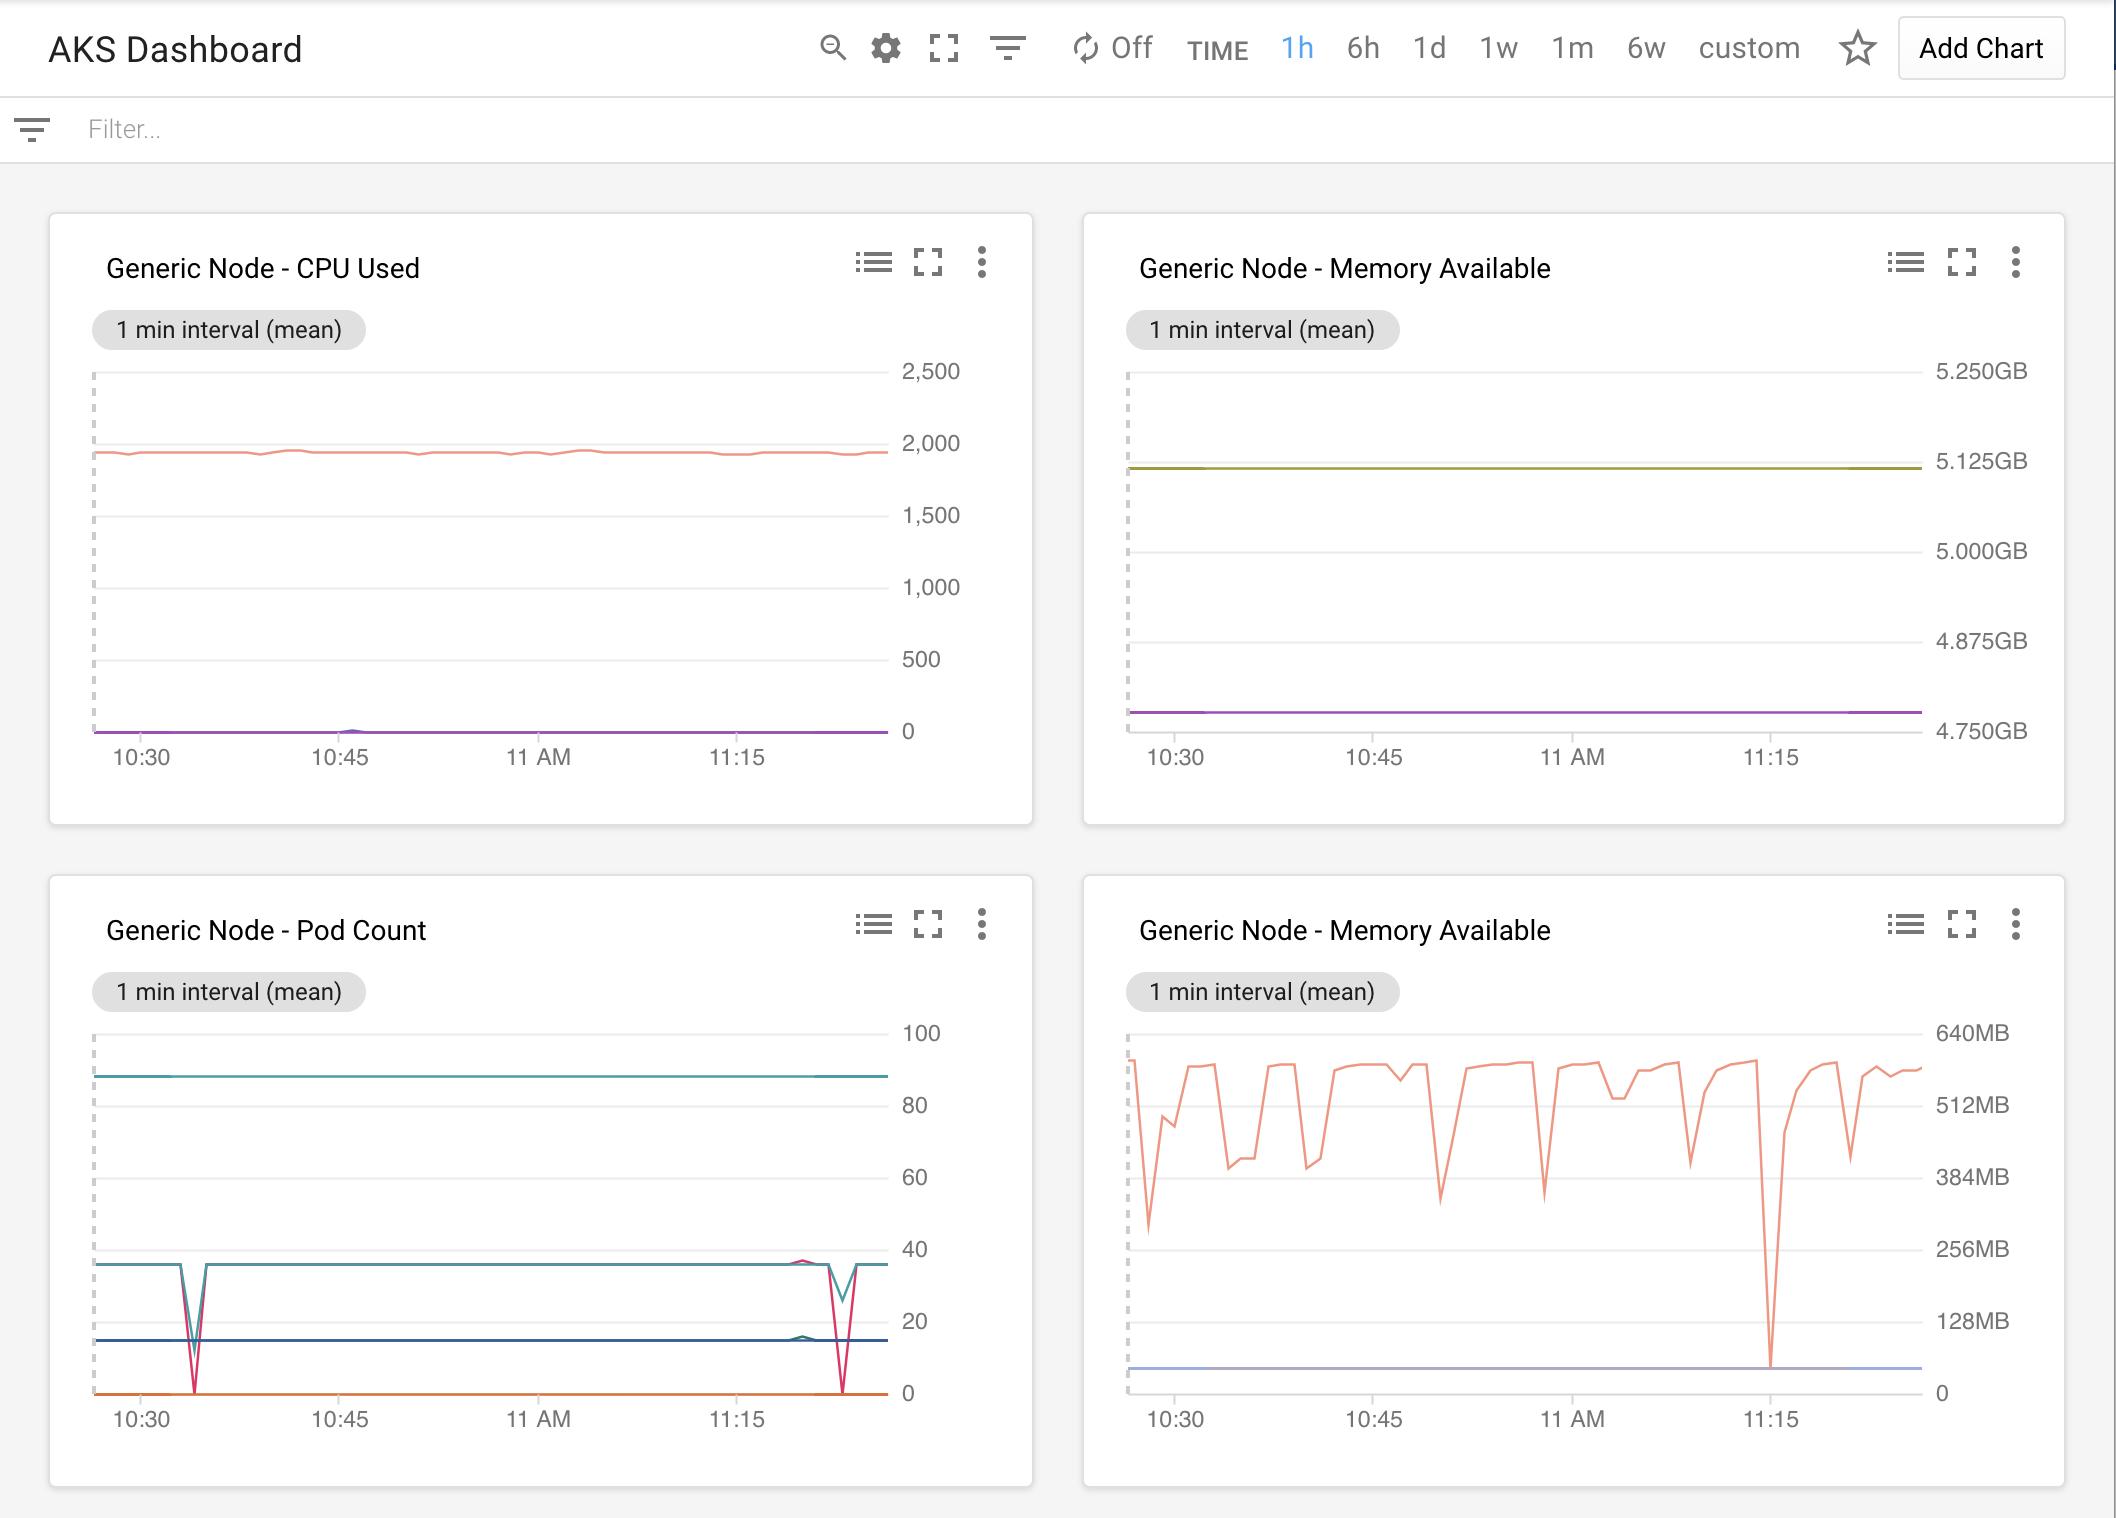 AKS dashboard displaying four charts.